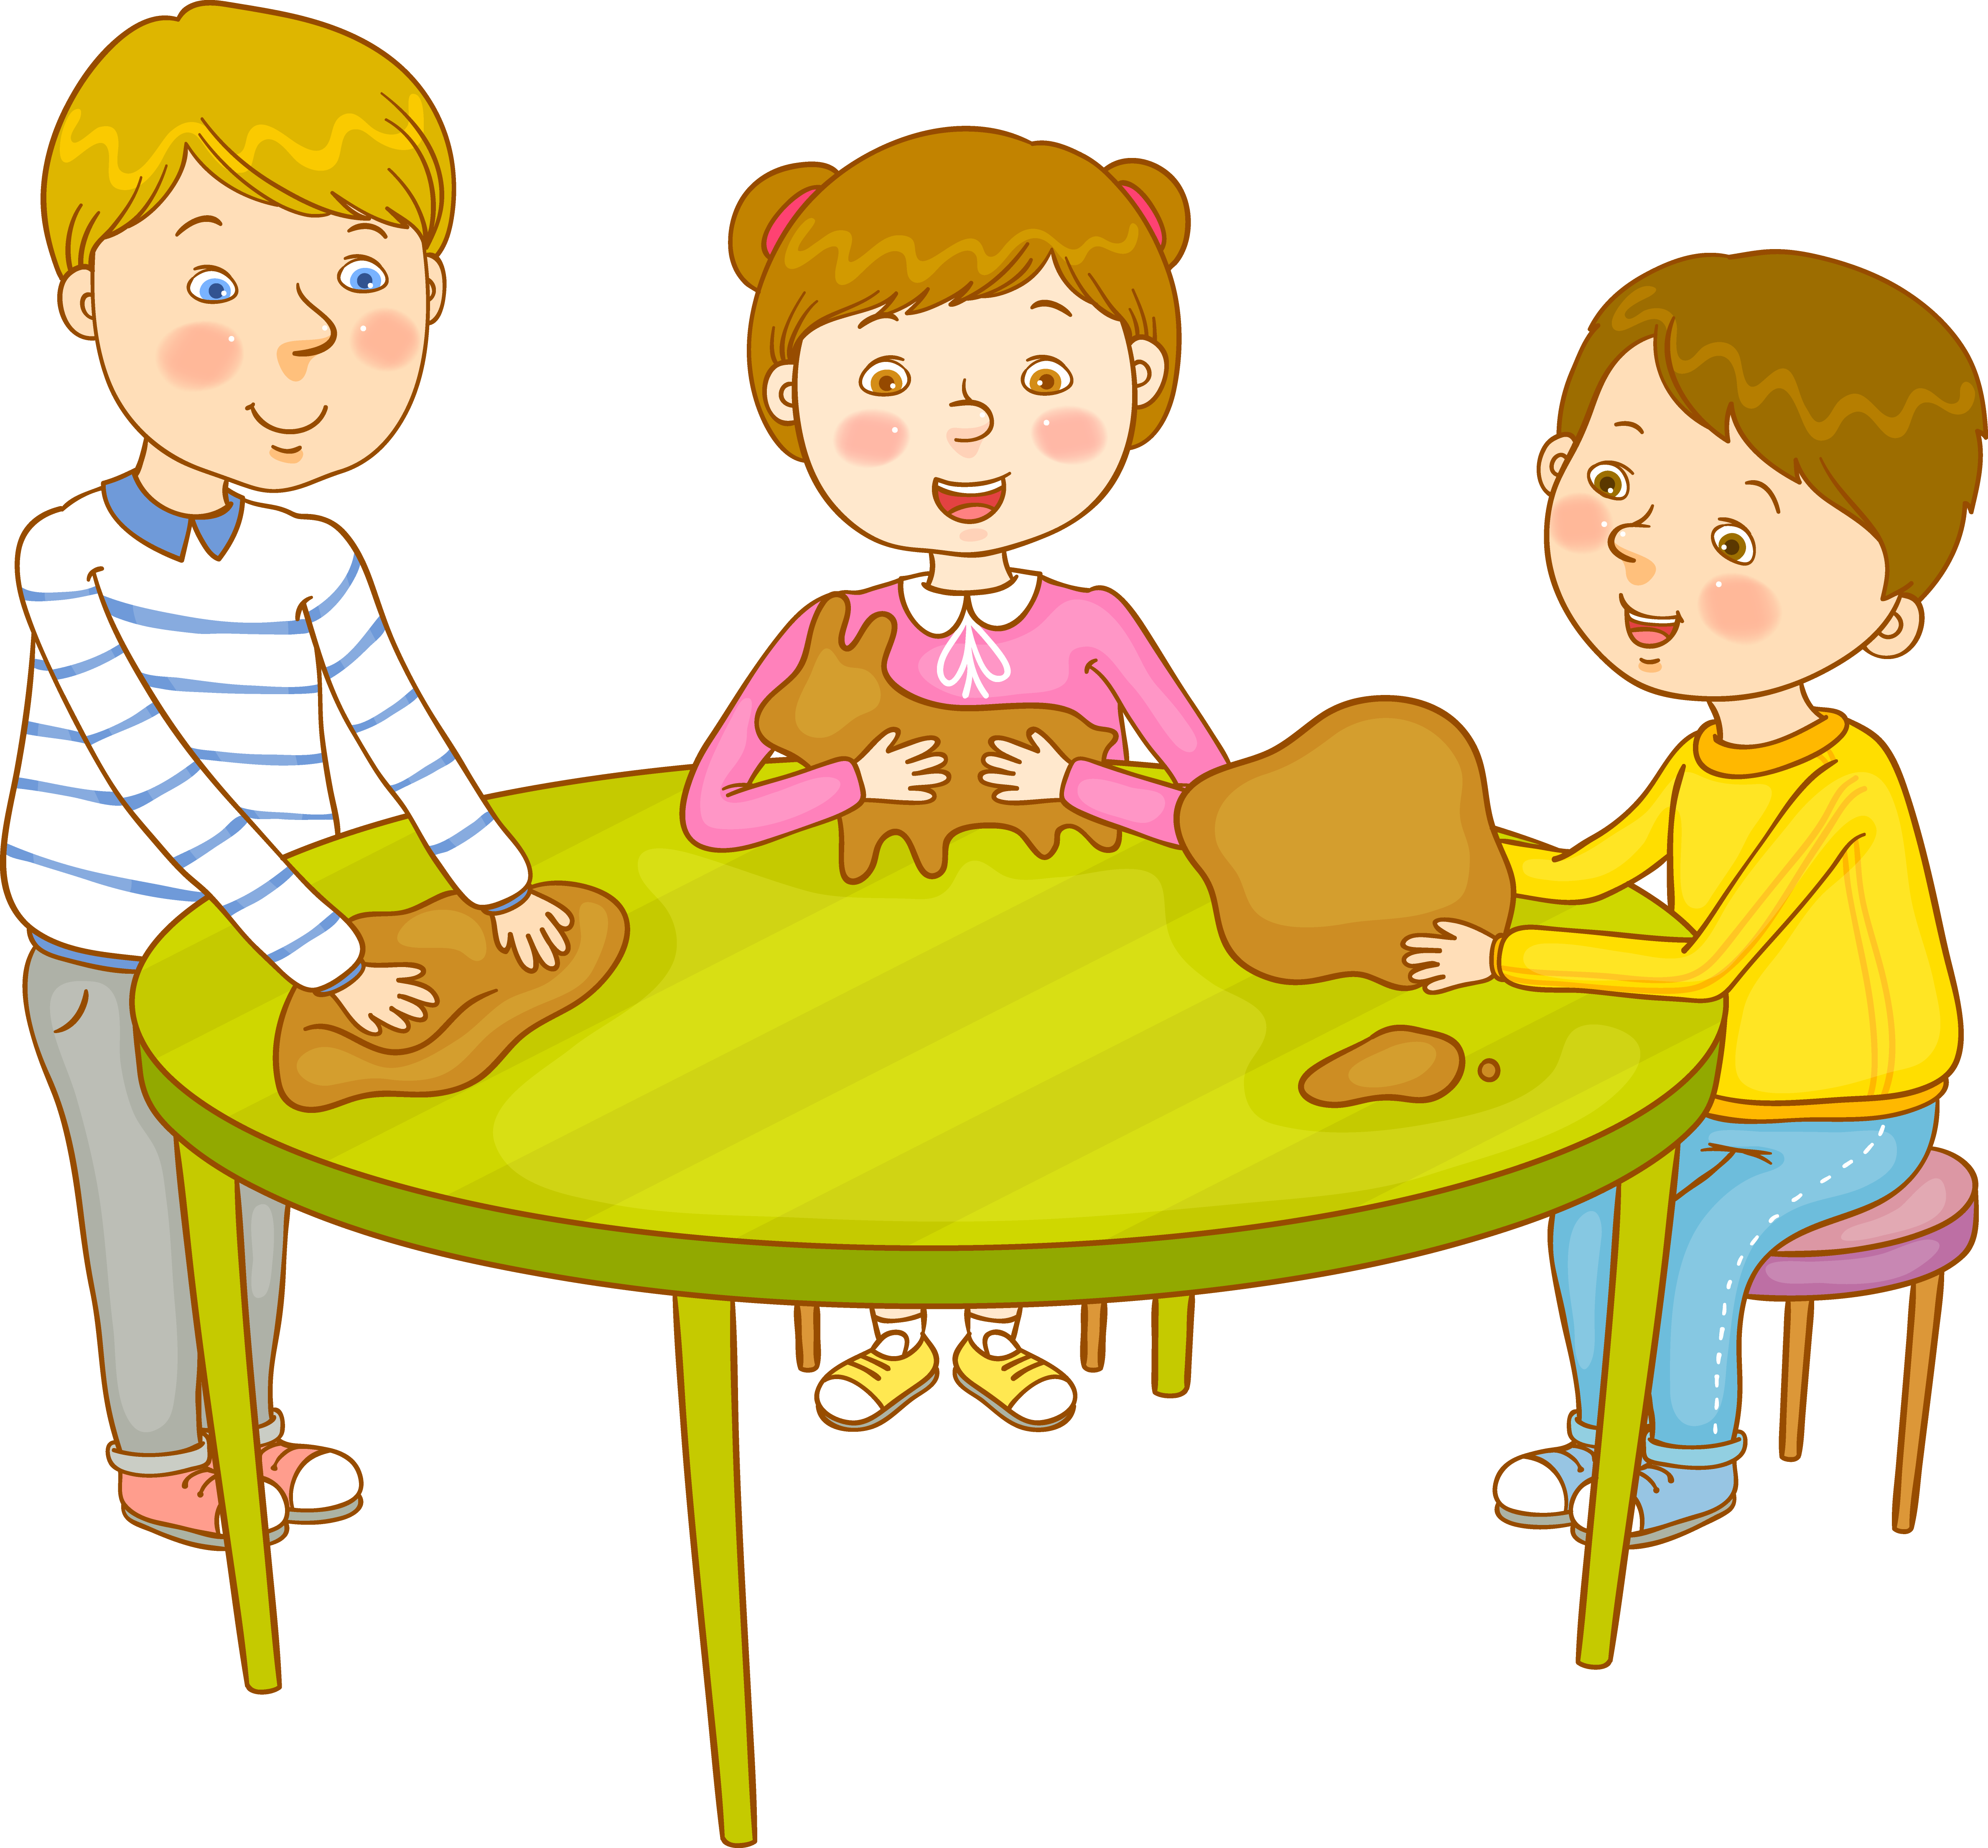 Child cartoon clip art. Furniture clipart children's